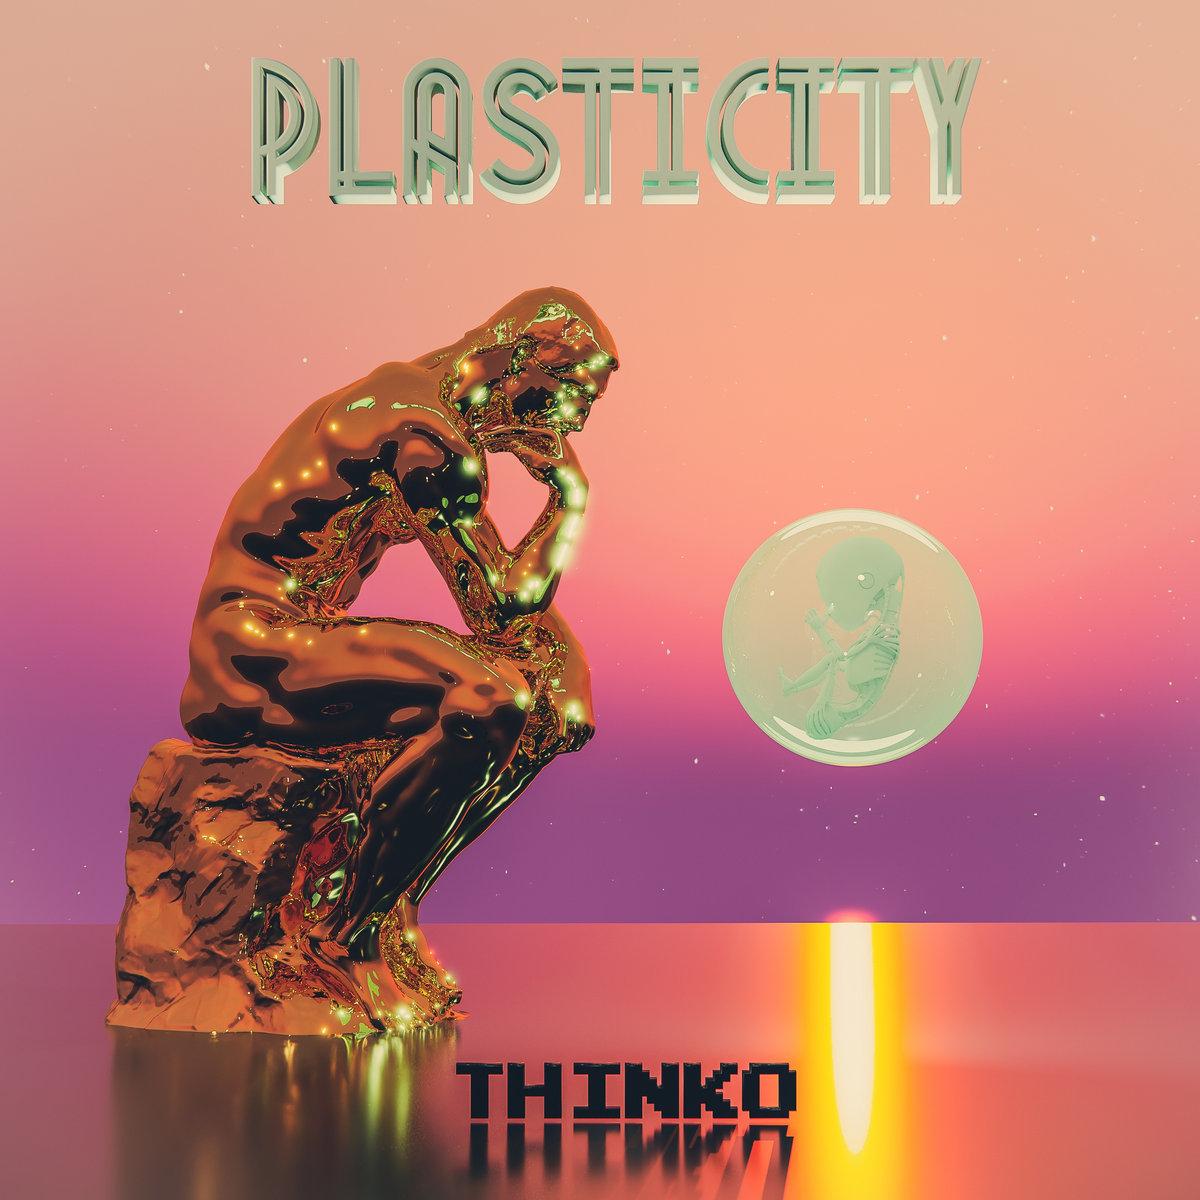 Thinko by Plasticity